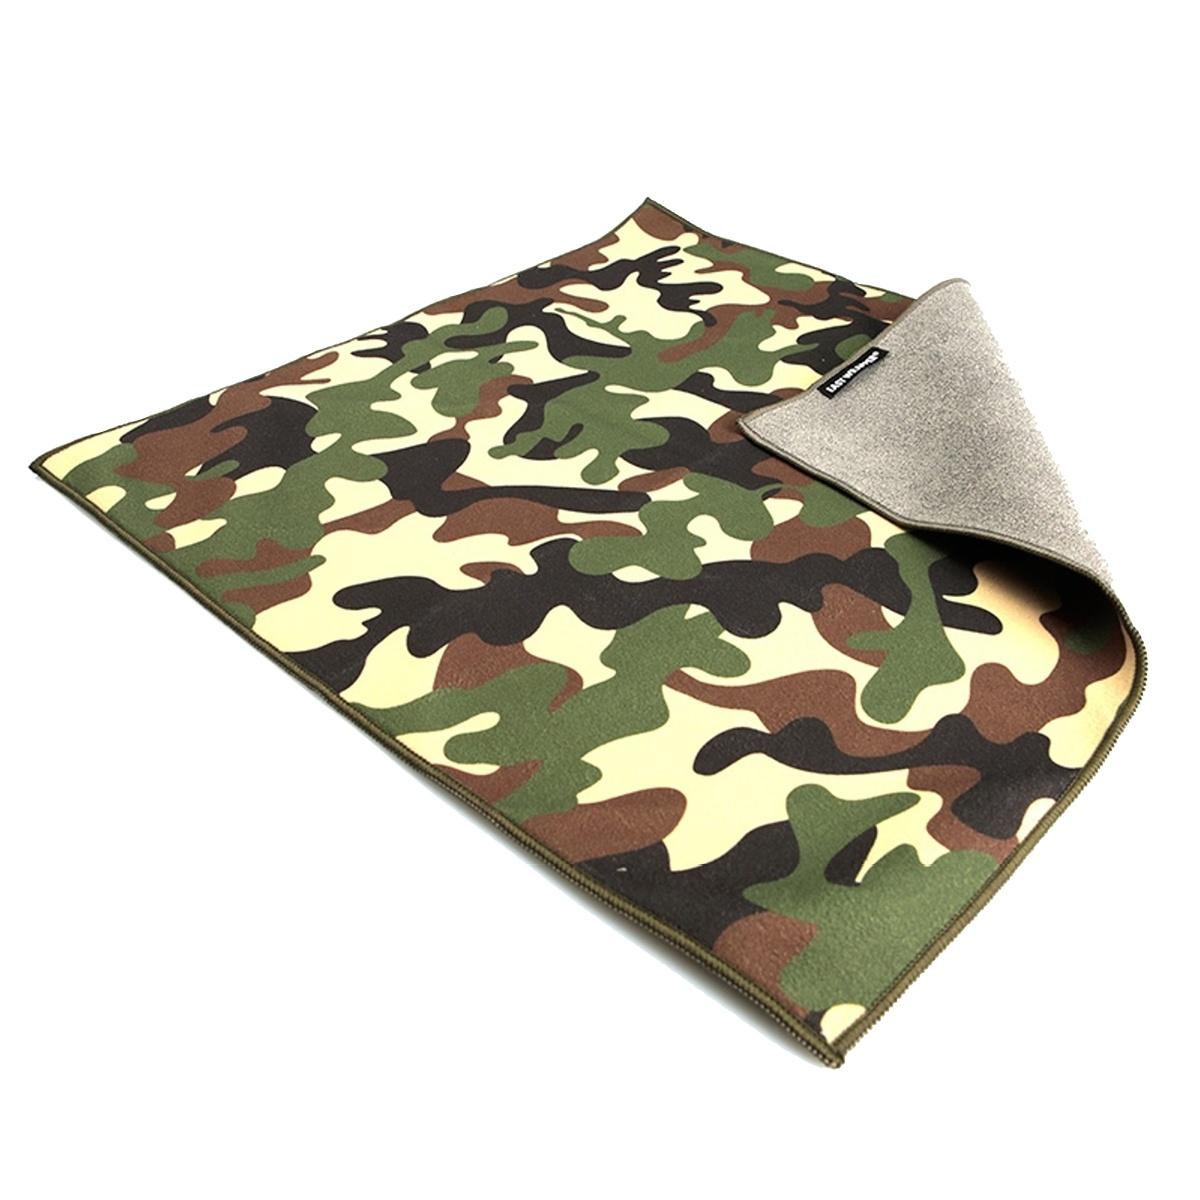 Einschlagtuch Easy Wrapper (L) Camouflage